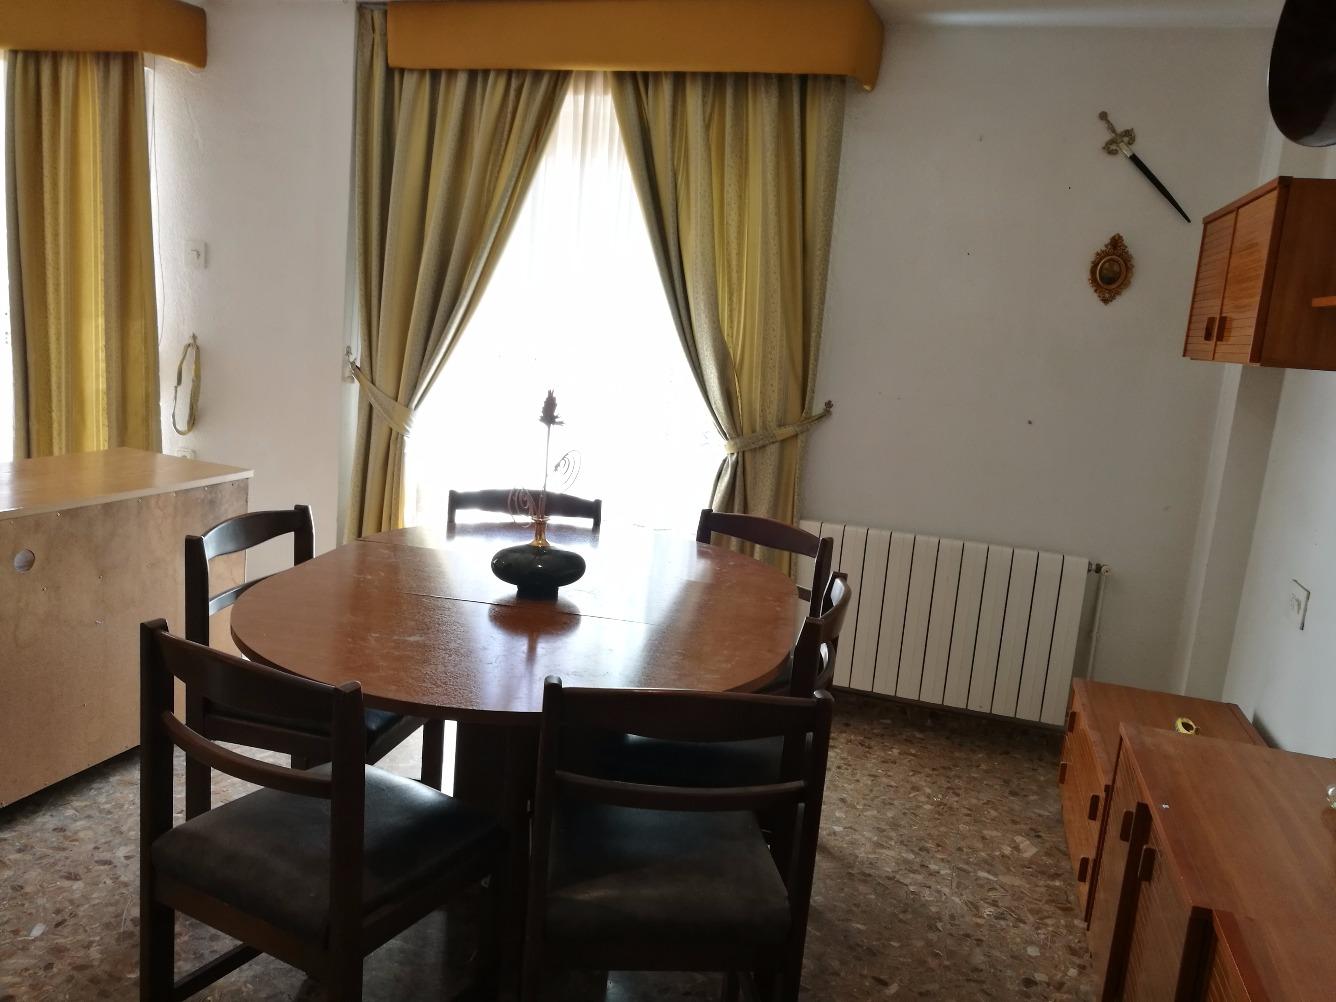 Affitto Appartamento  Crevillent, zona de - crevillent. Alquiler piso de 150 m2 por 350 €/mes!!